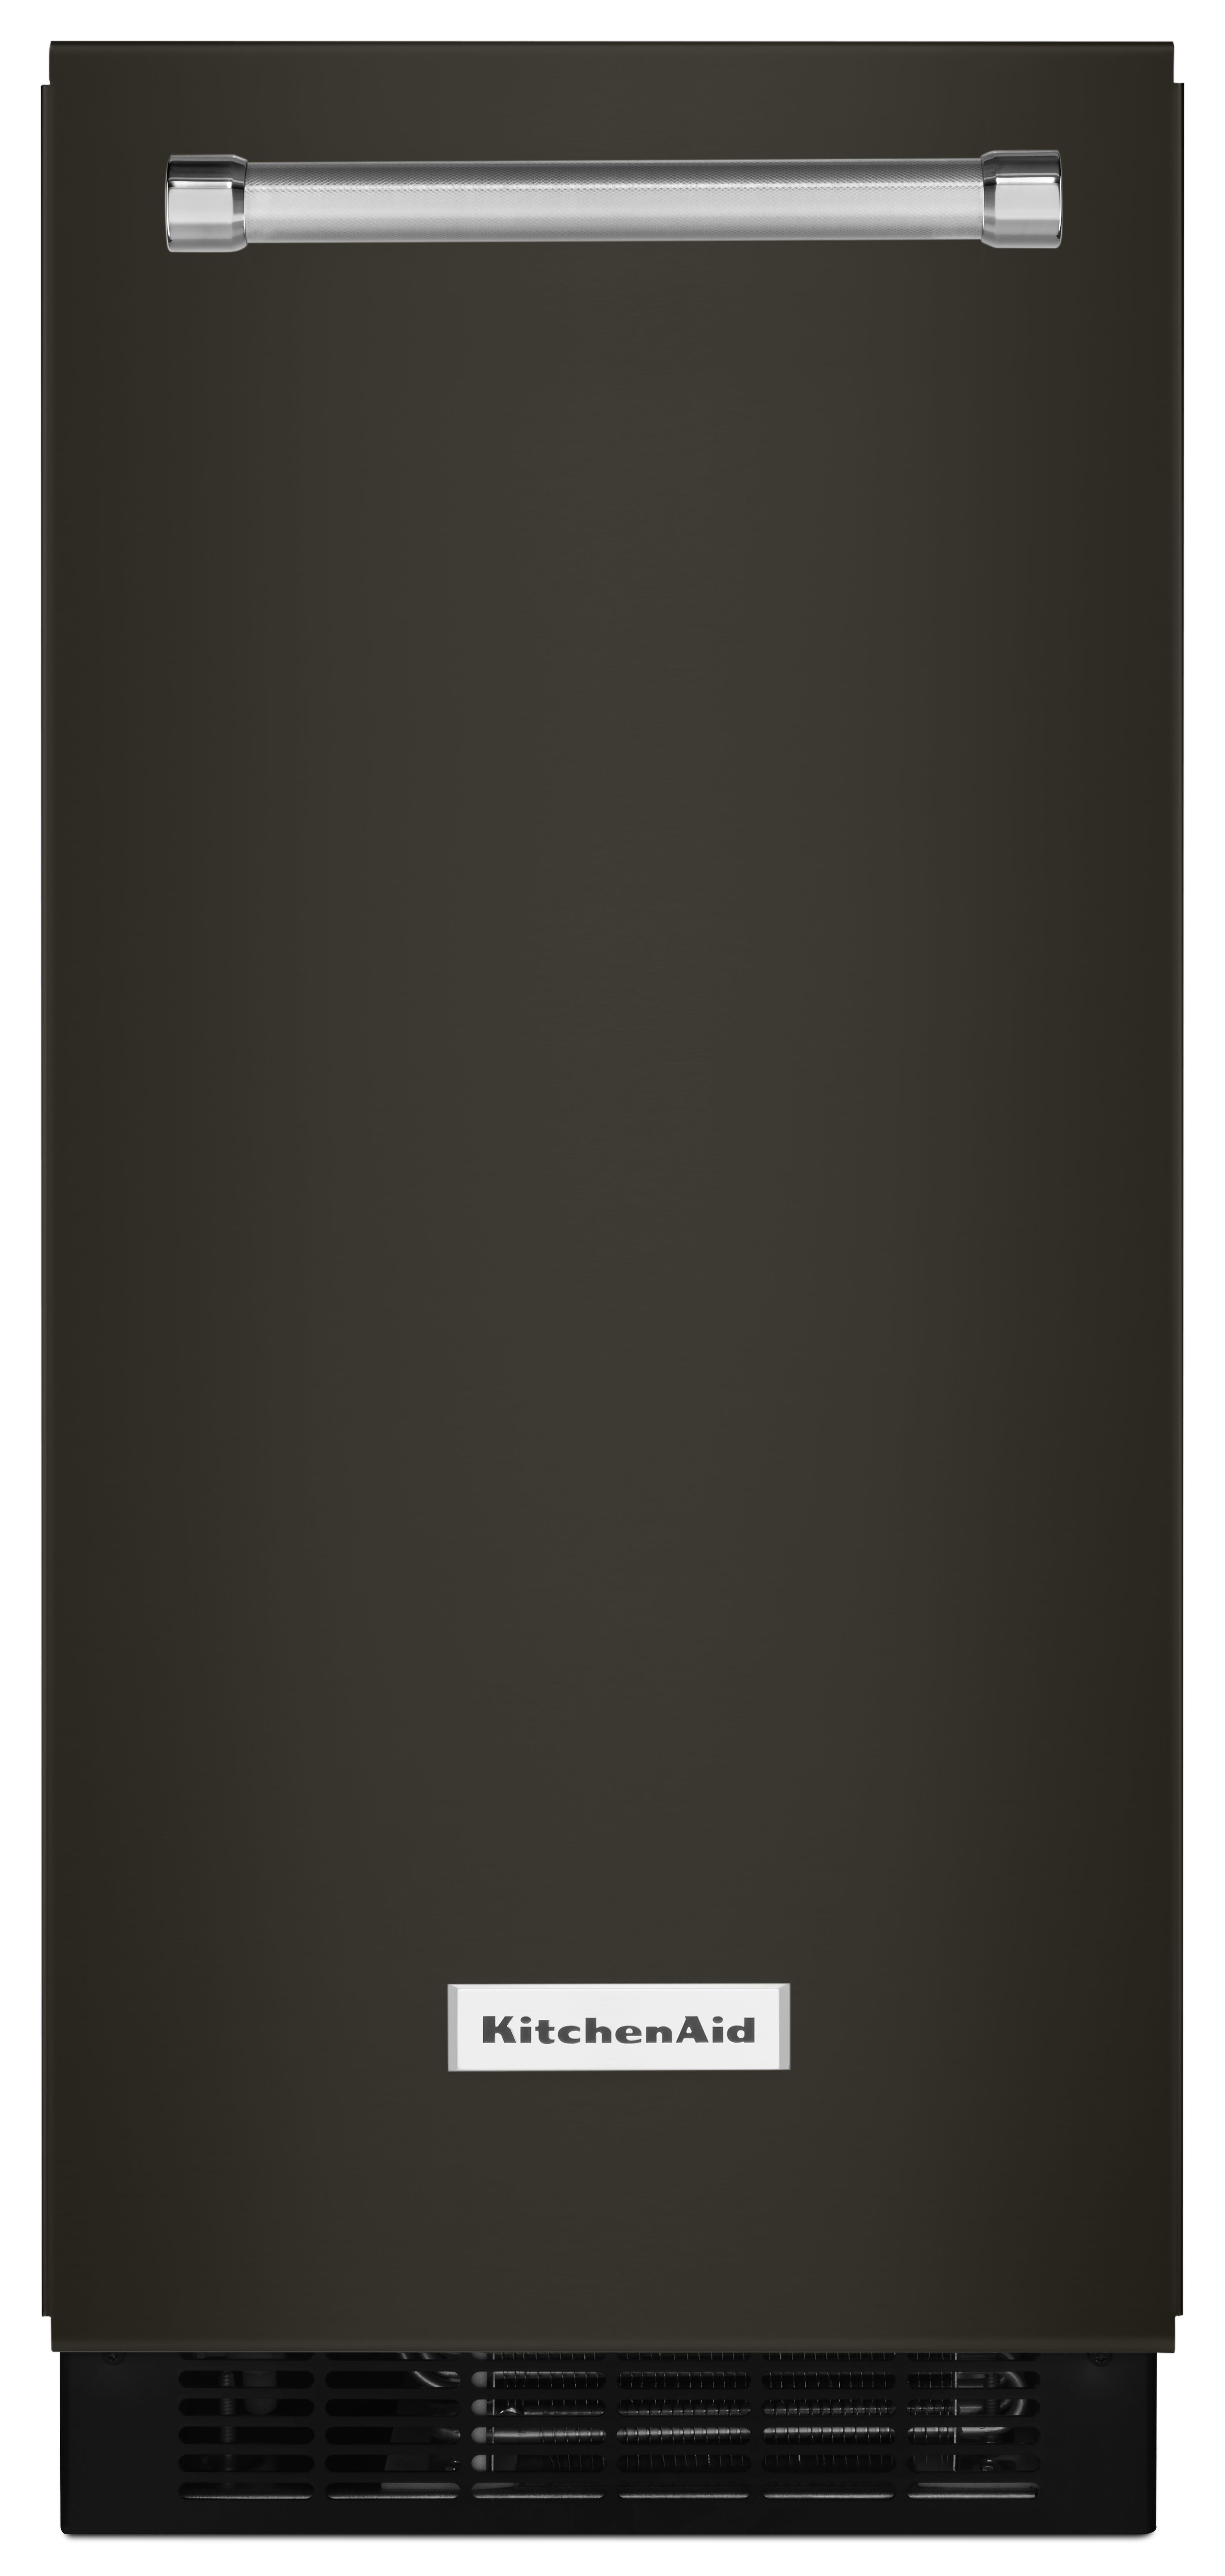 kitchenaid 15 automatic ice maker black stainless kuix505ebs home rh themaytagstoreusa com